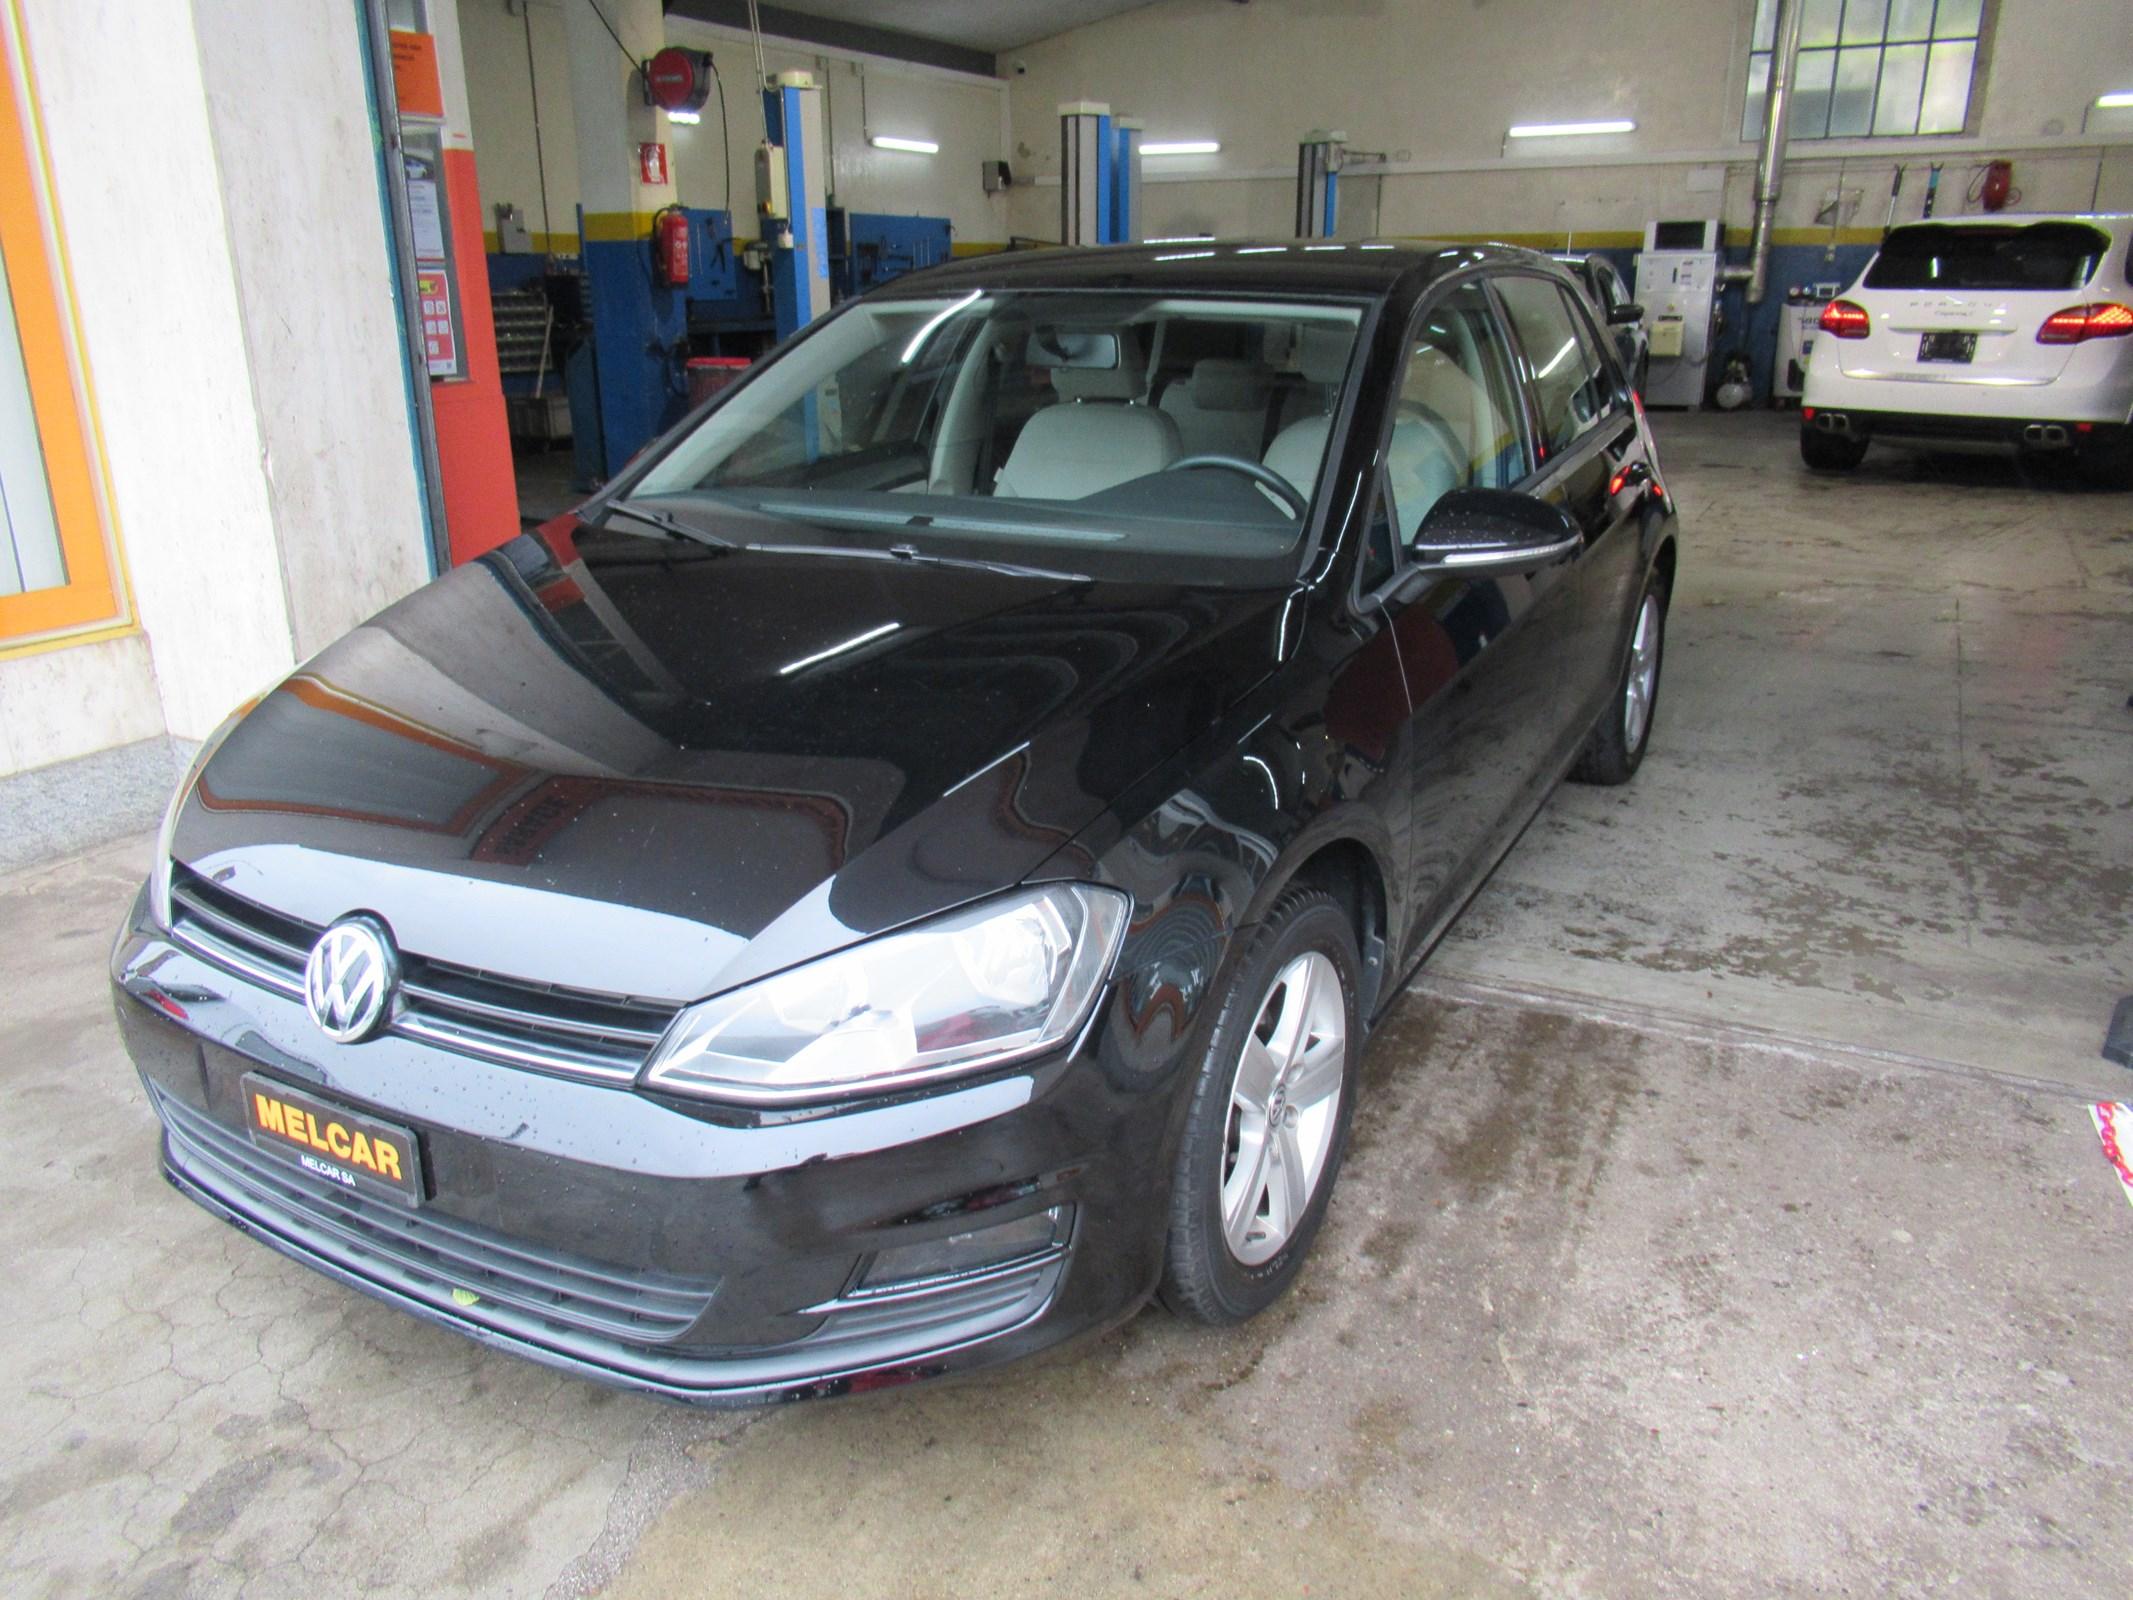 saloon VW Golf 1.6 TDI Trendline